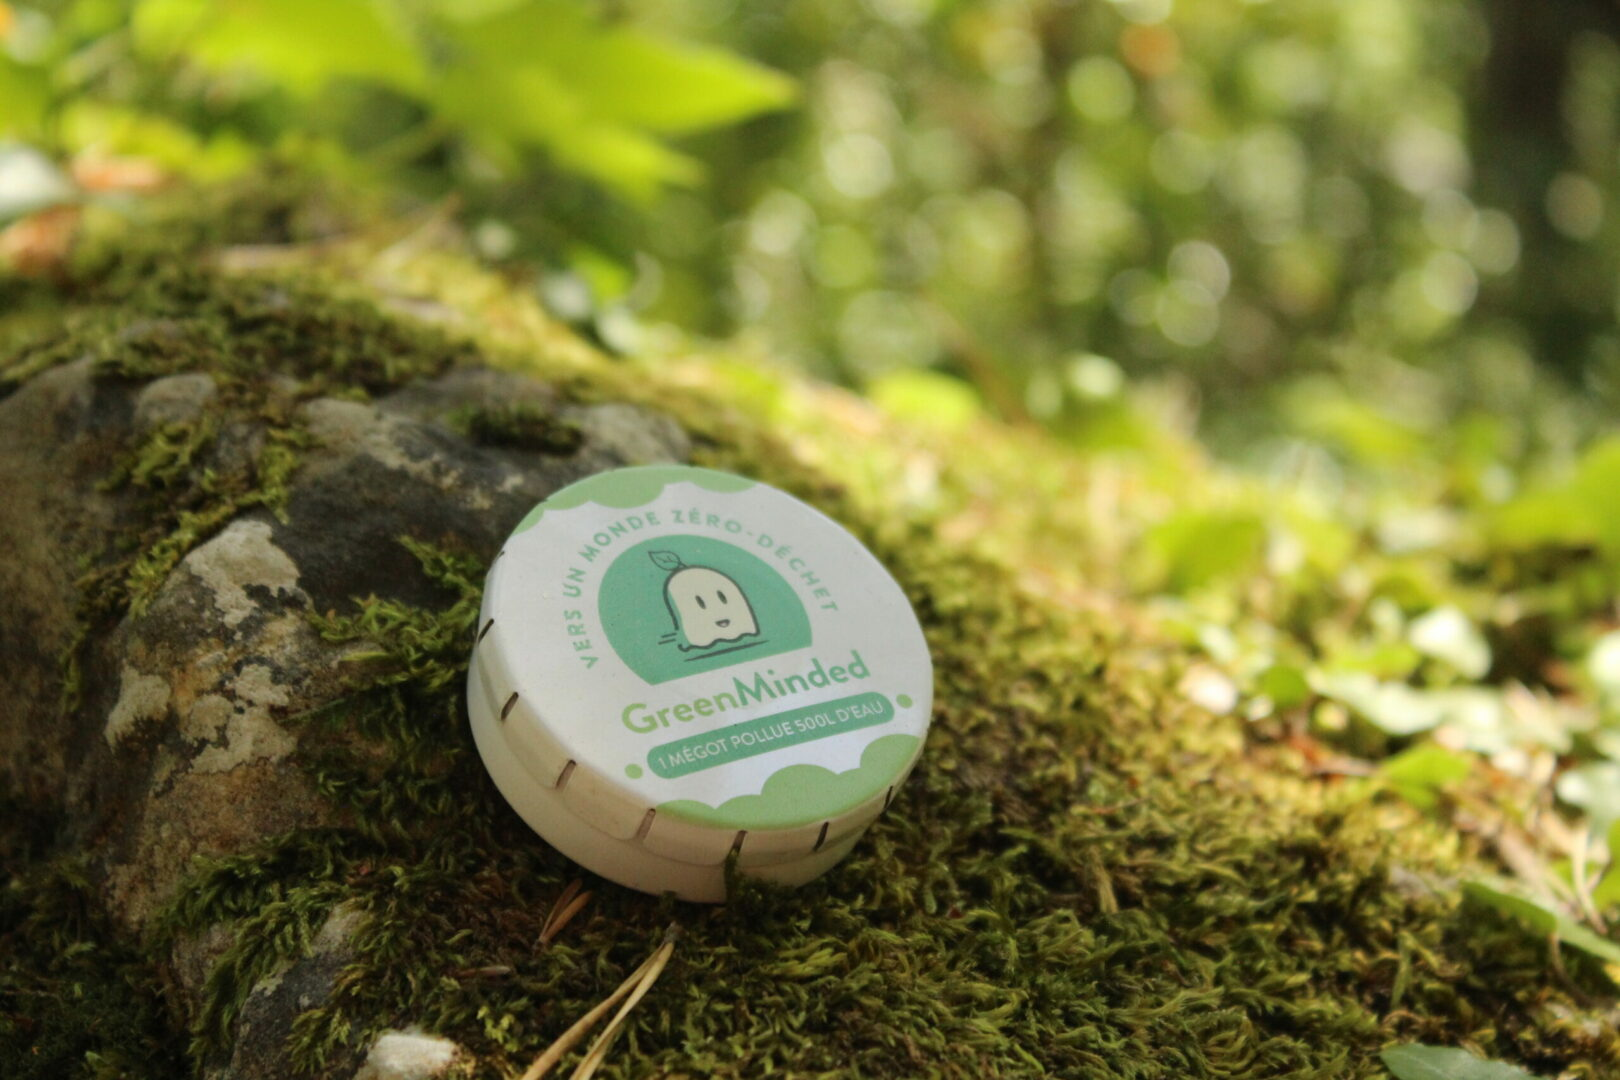 CENDRIER DE POCHE GREENMINDED Collecte recyclage mégots de cigarettes - GreenMinded